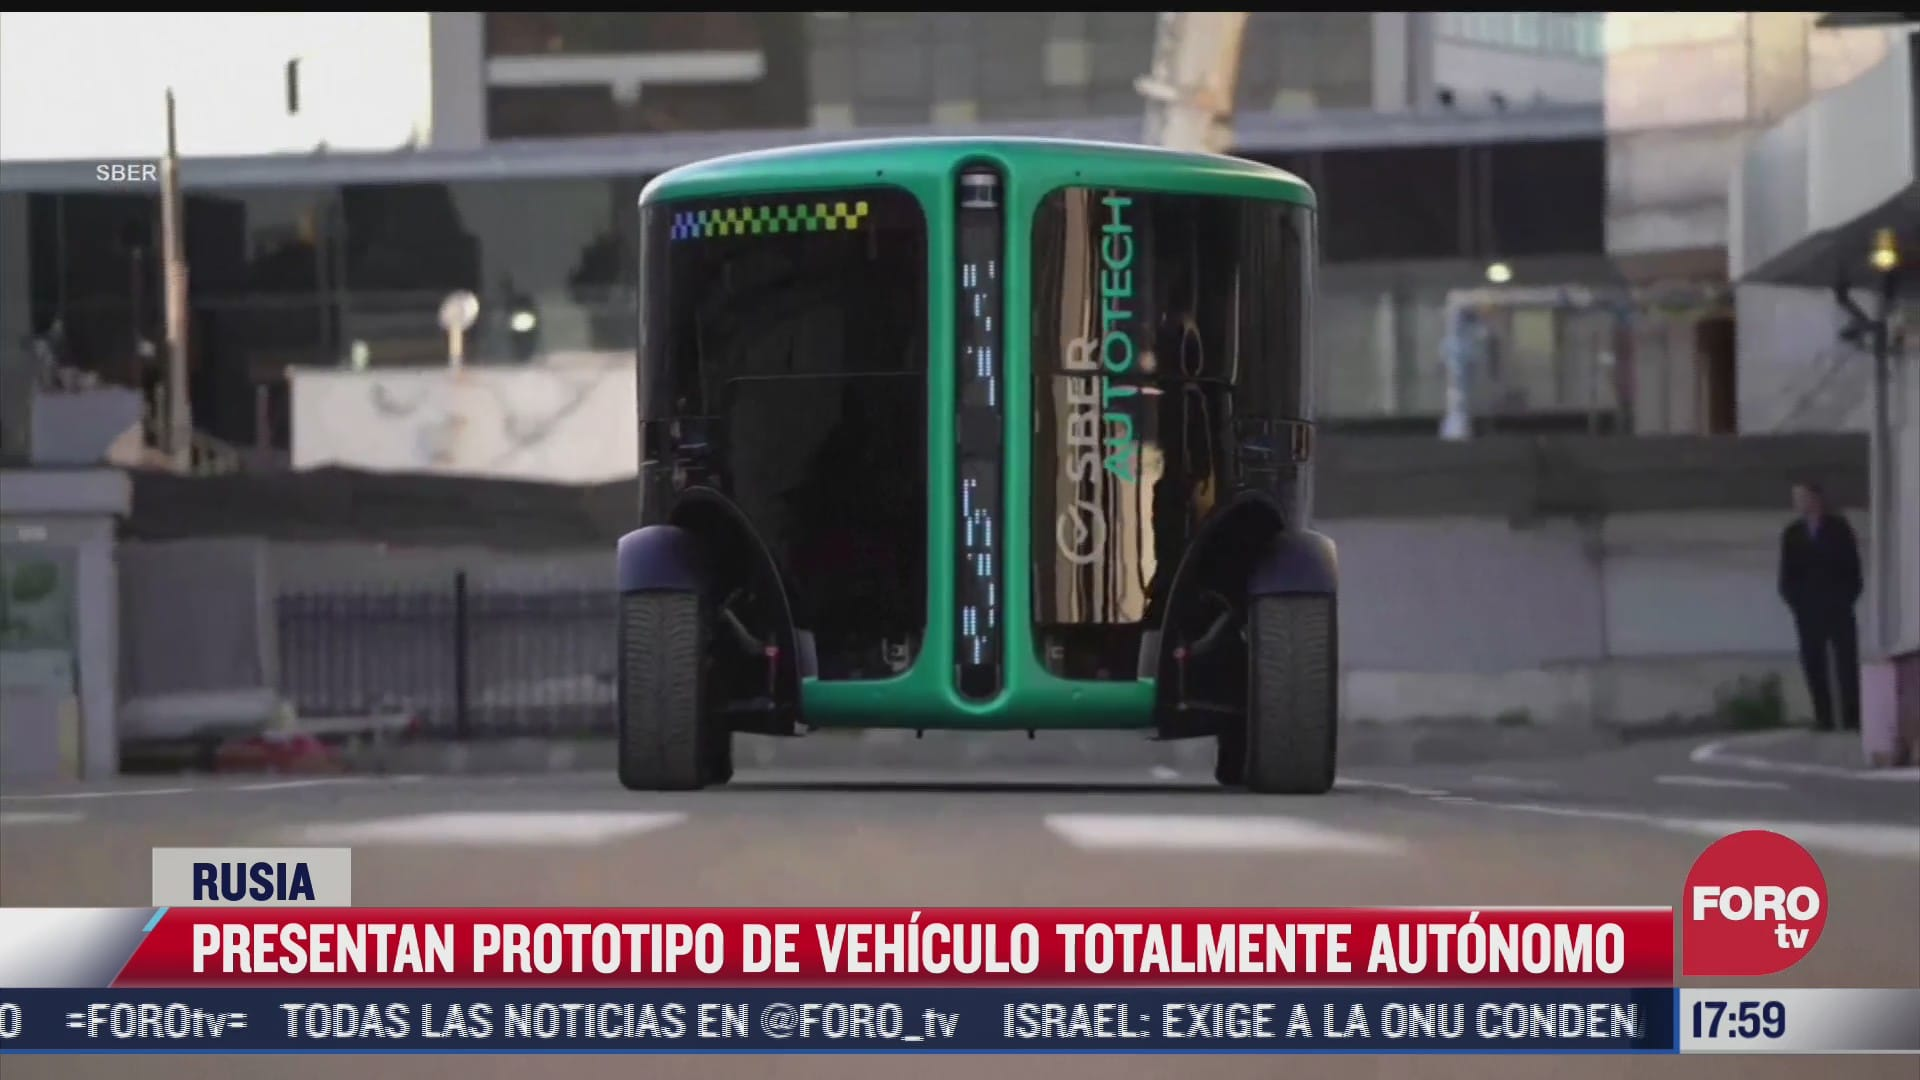 presentan prototipo de taxi totalmente autonomo